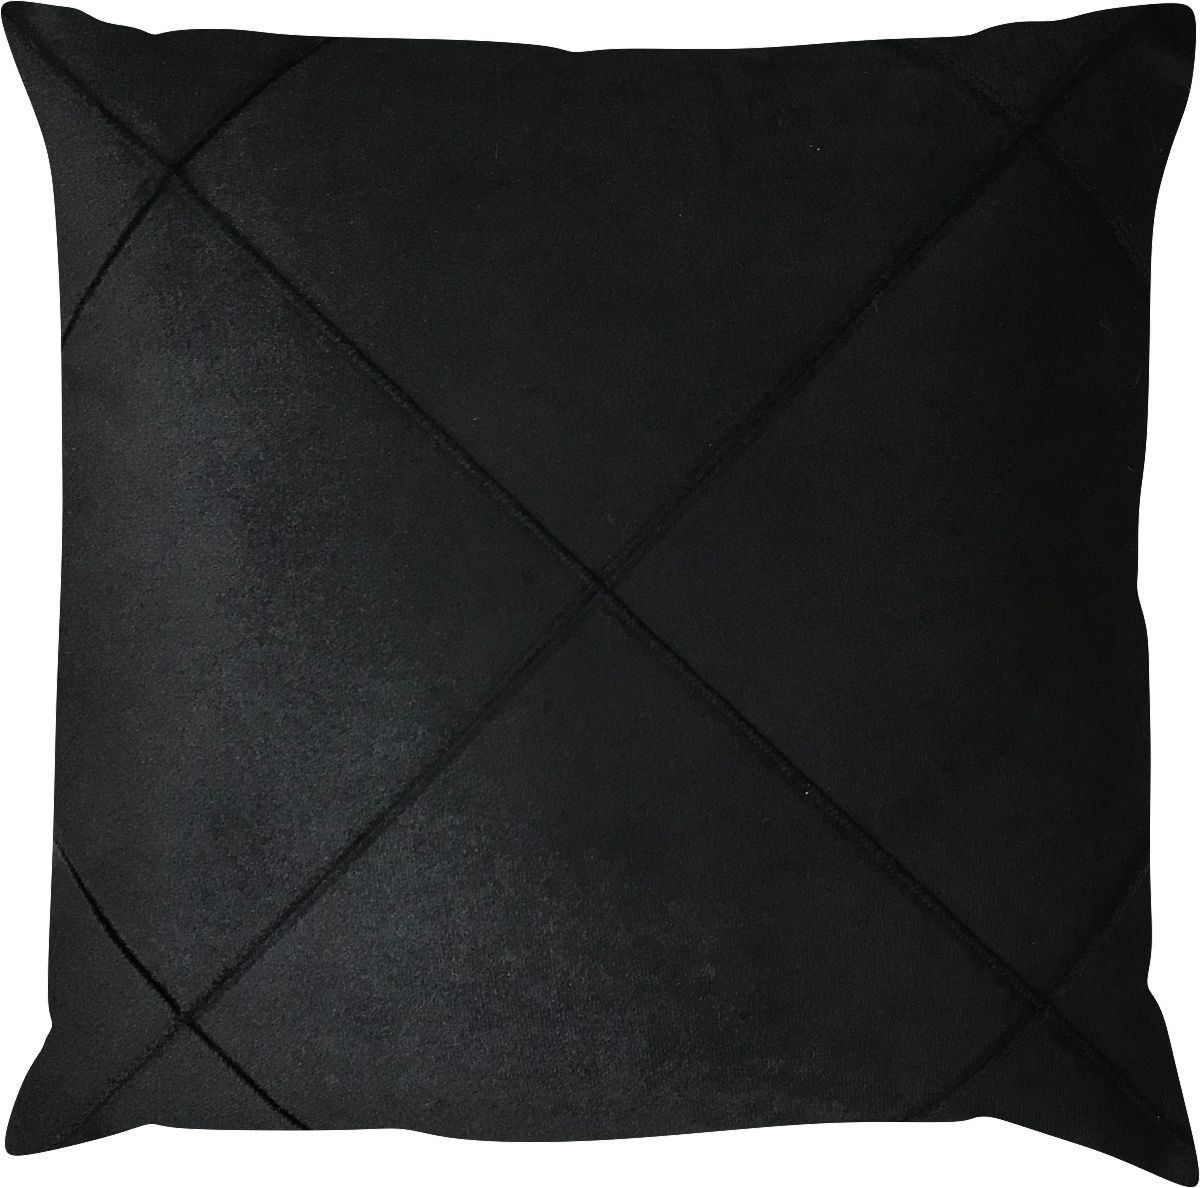 Capa de Almofada Drapeada Veludo Preto 43x43